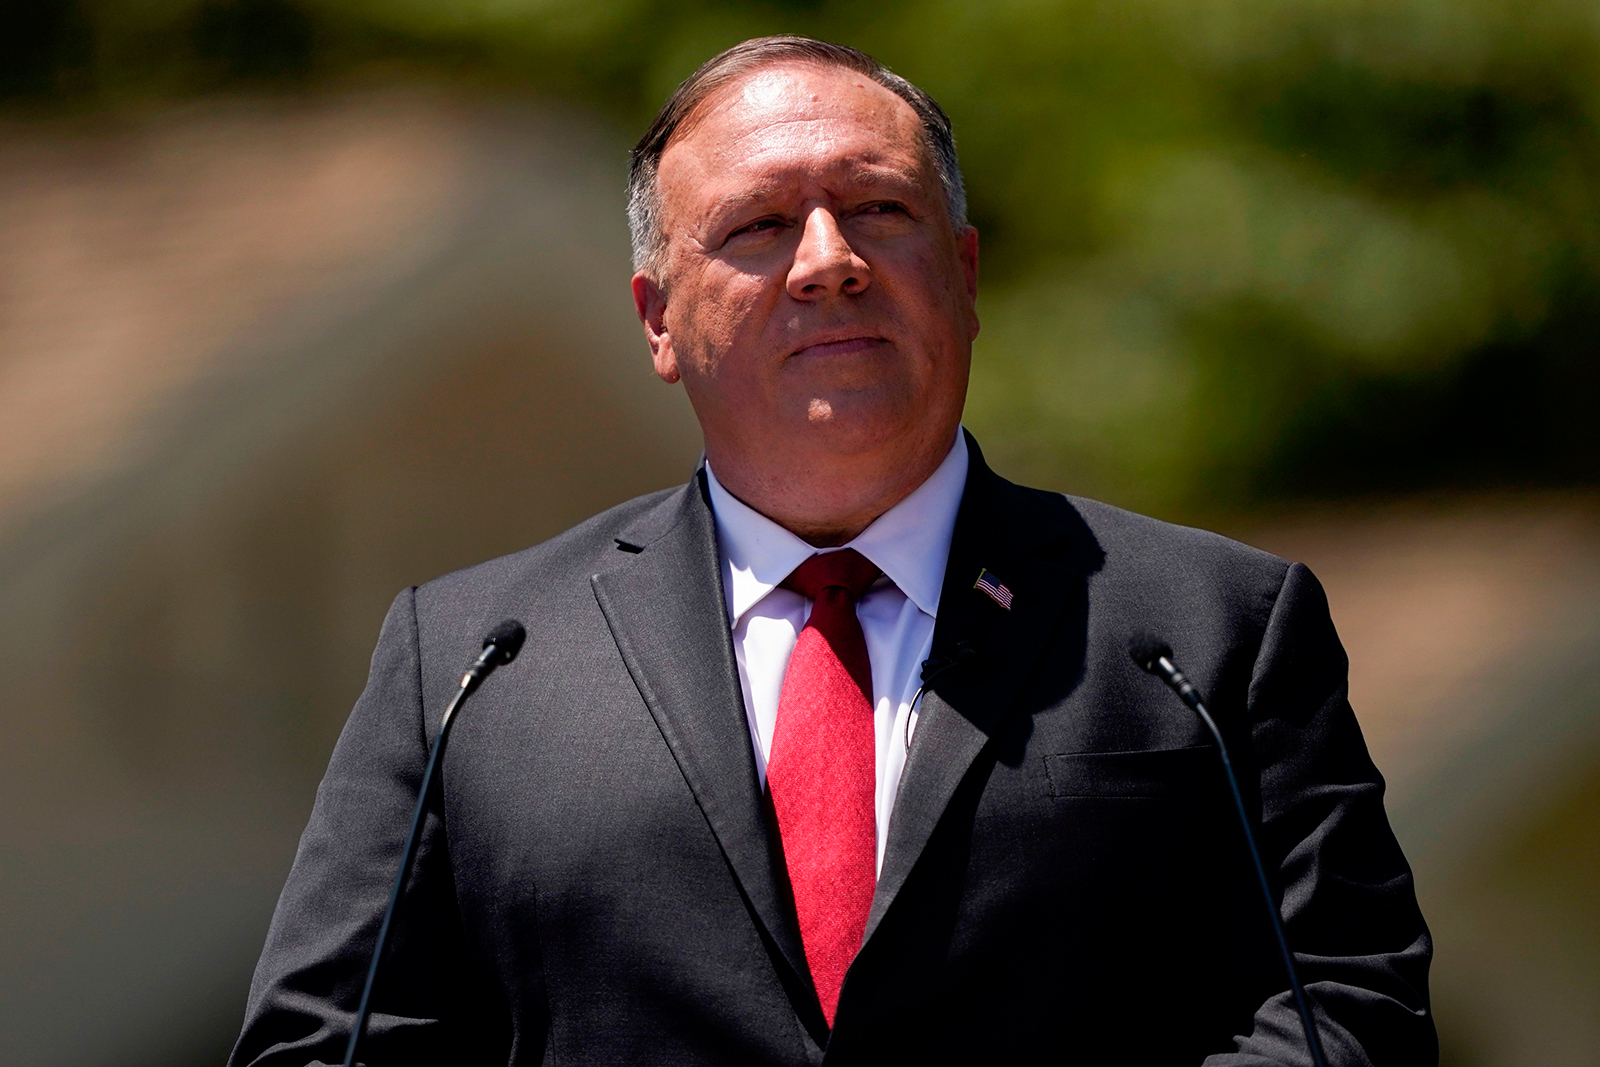 US has reimposed UN sanctions on Iran, Pompeo says